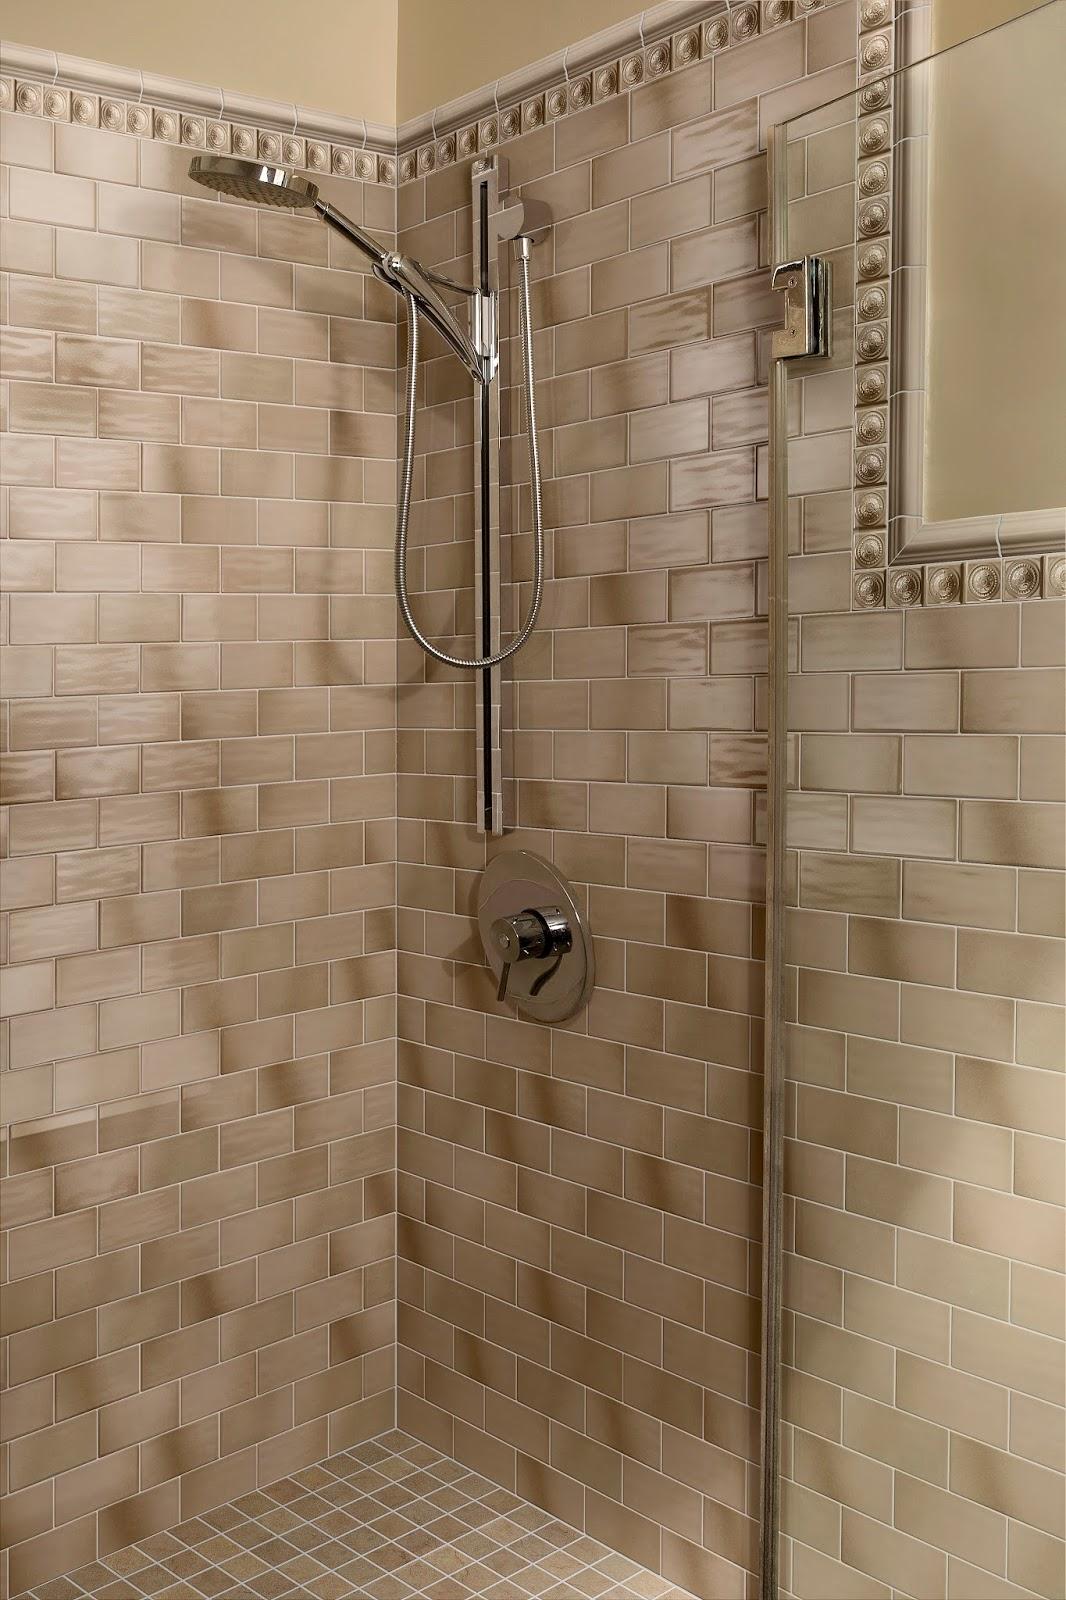 Isc Surfaces Florida Tile S Retroclassique Is Modern Yet